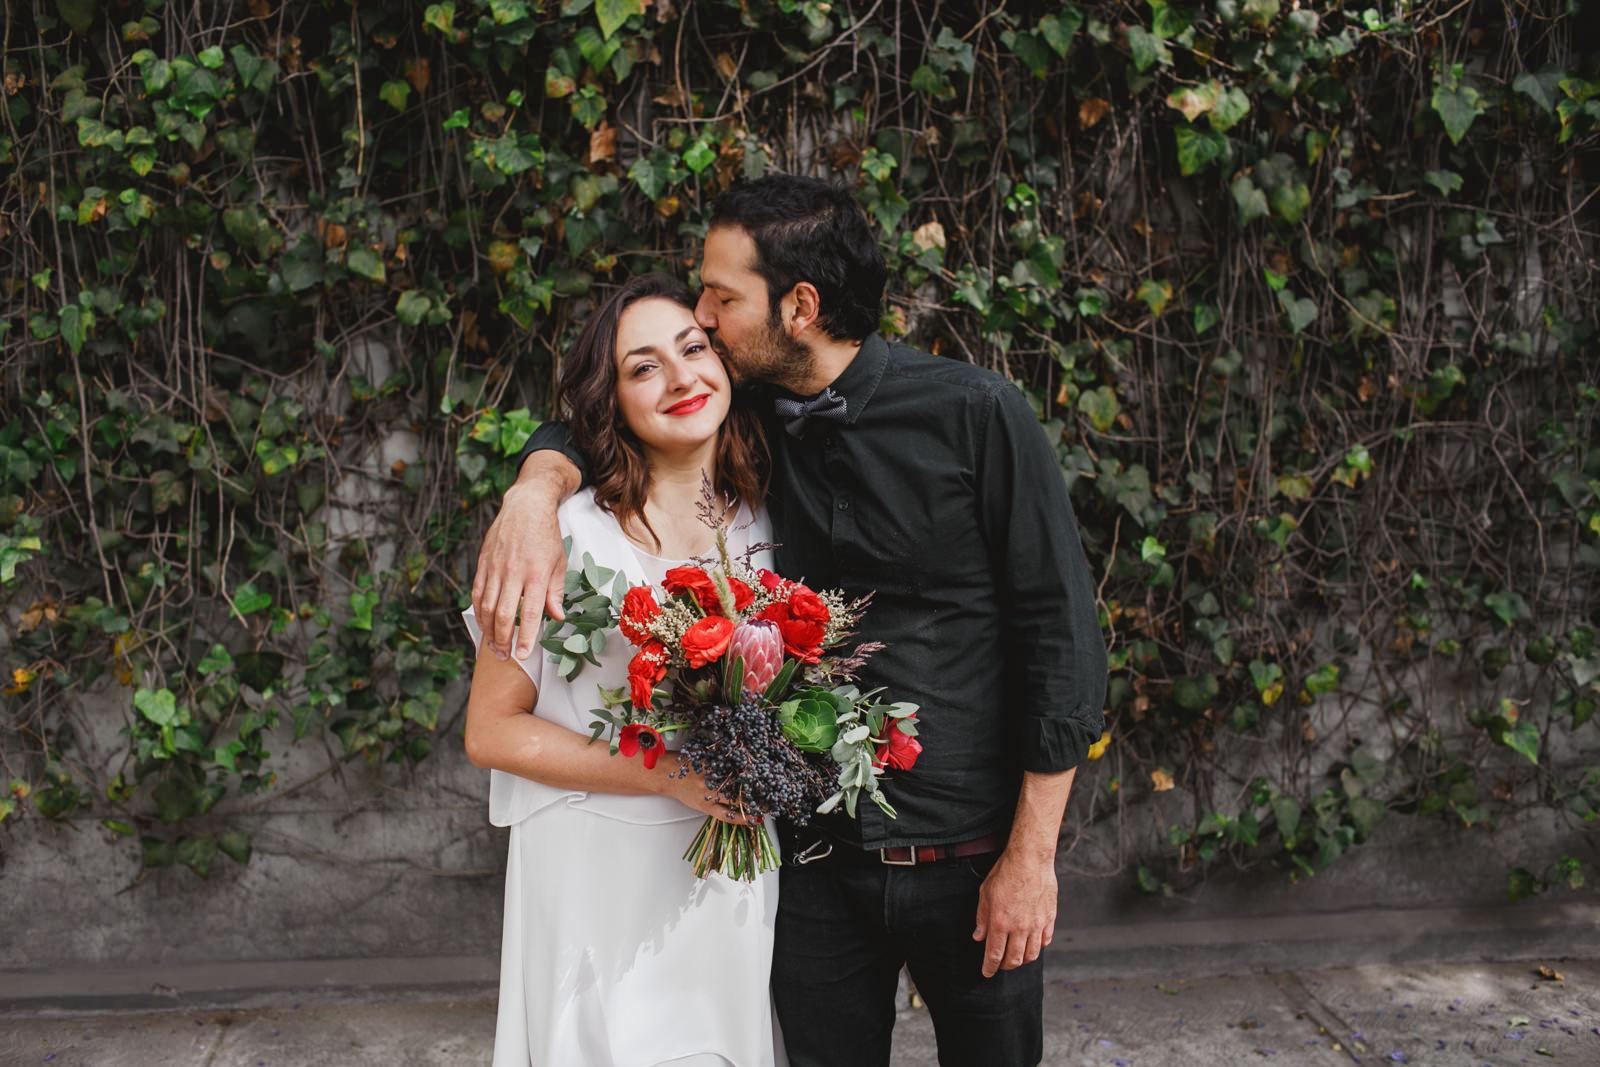 boda-en-cdmx-armando-aragon-021